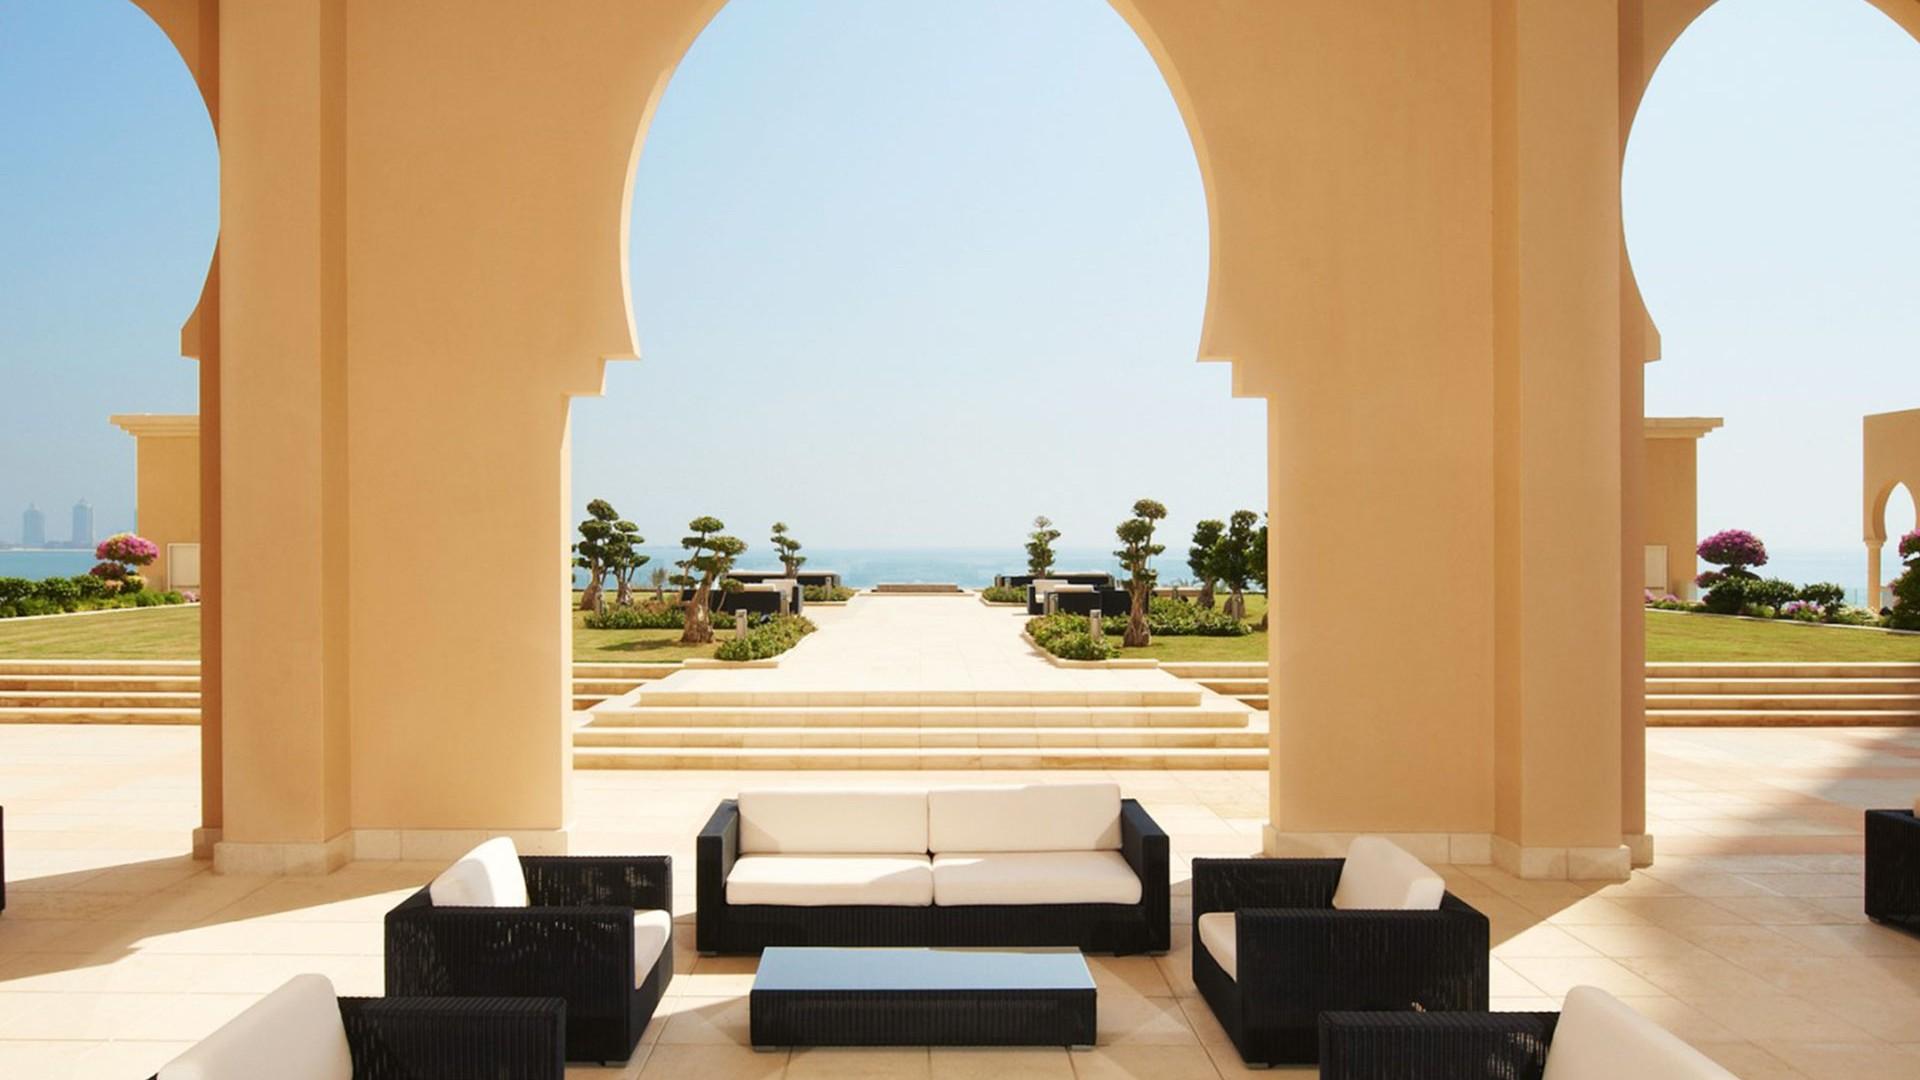 Sarab lounge at the St Regis